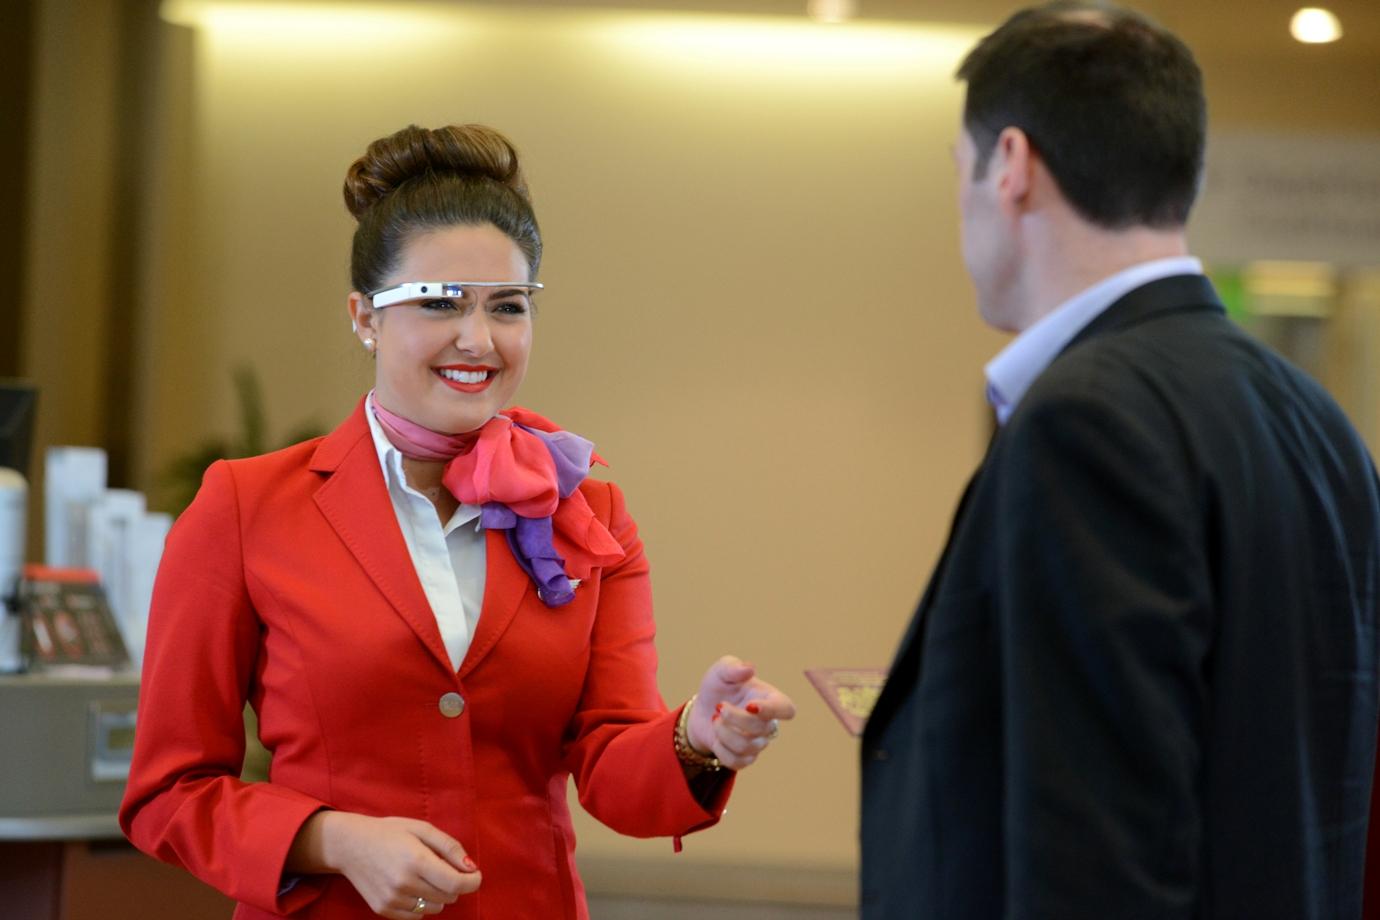 Virgin Atlantic Pilots Google Glass at Heathrow